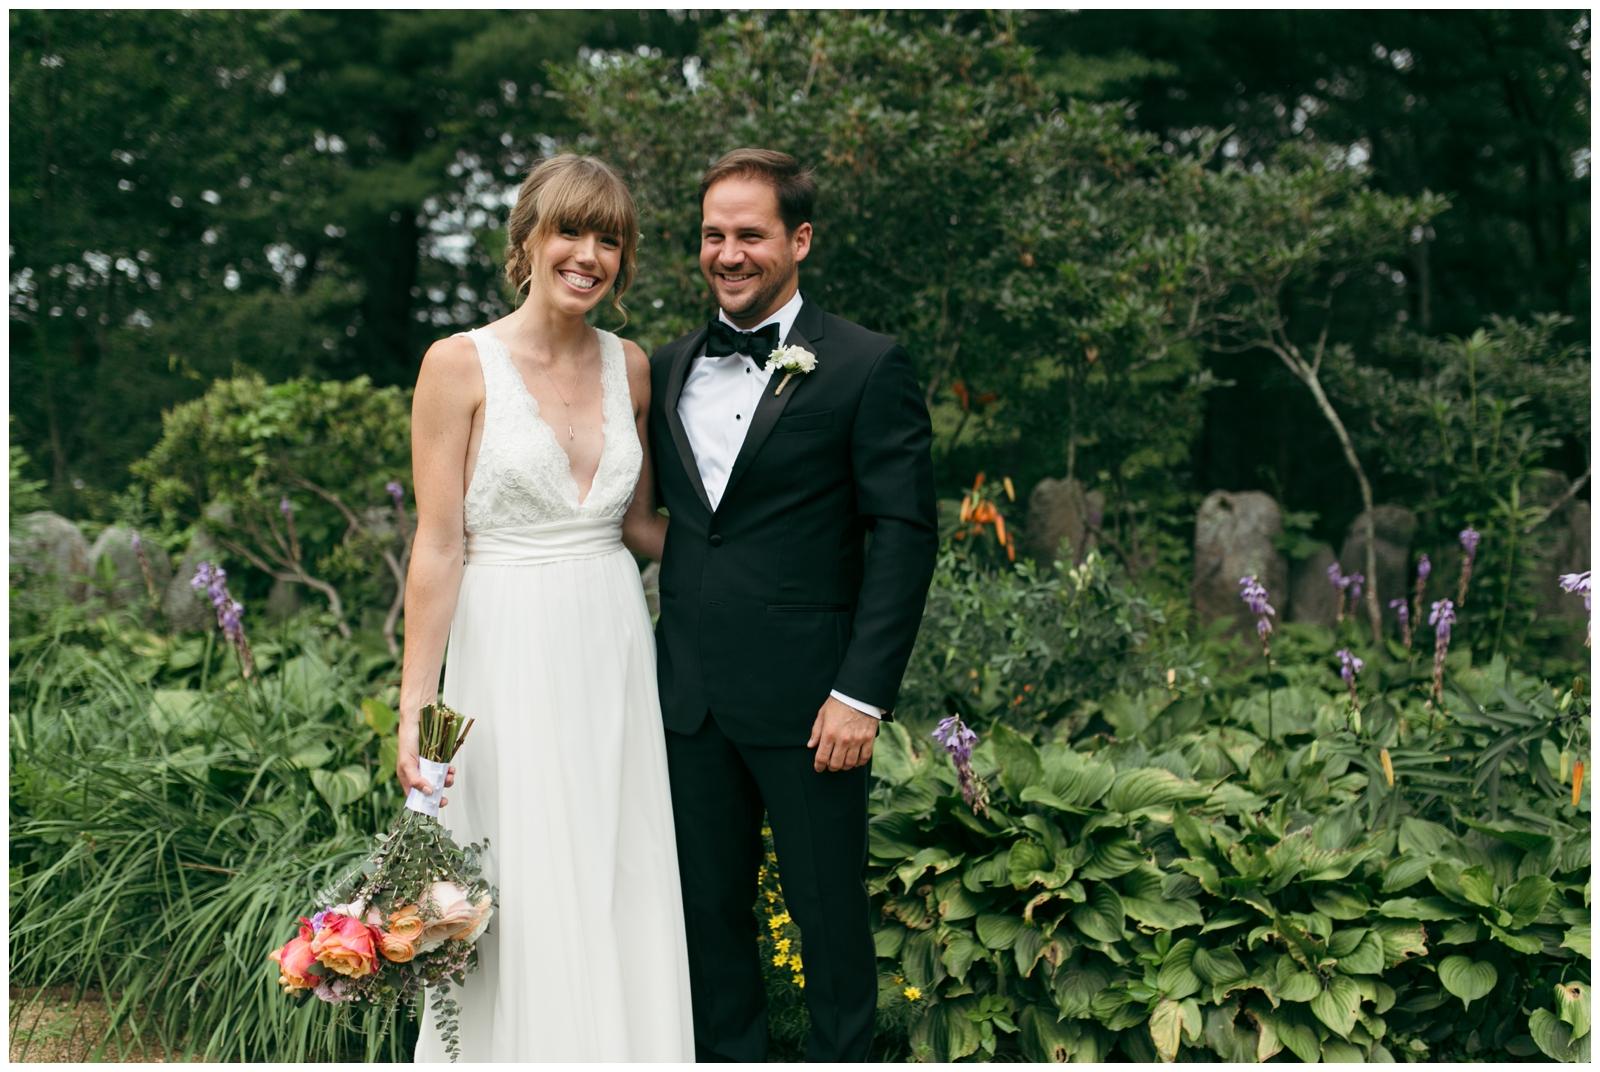 Moraine-Farm-wedding-Bailey-Q-Photo-Massachusetts-wedding-photpgrapher-021.jpg